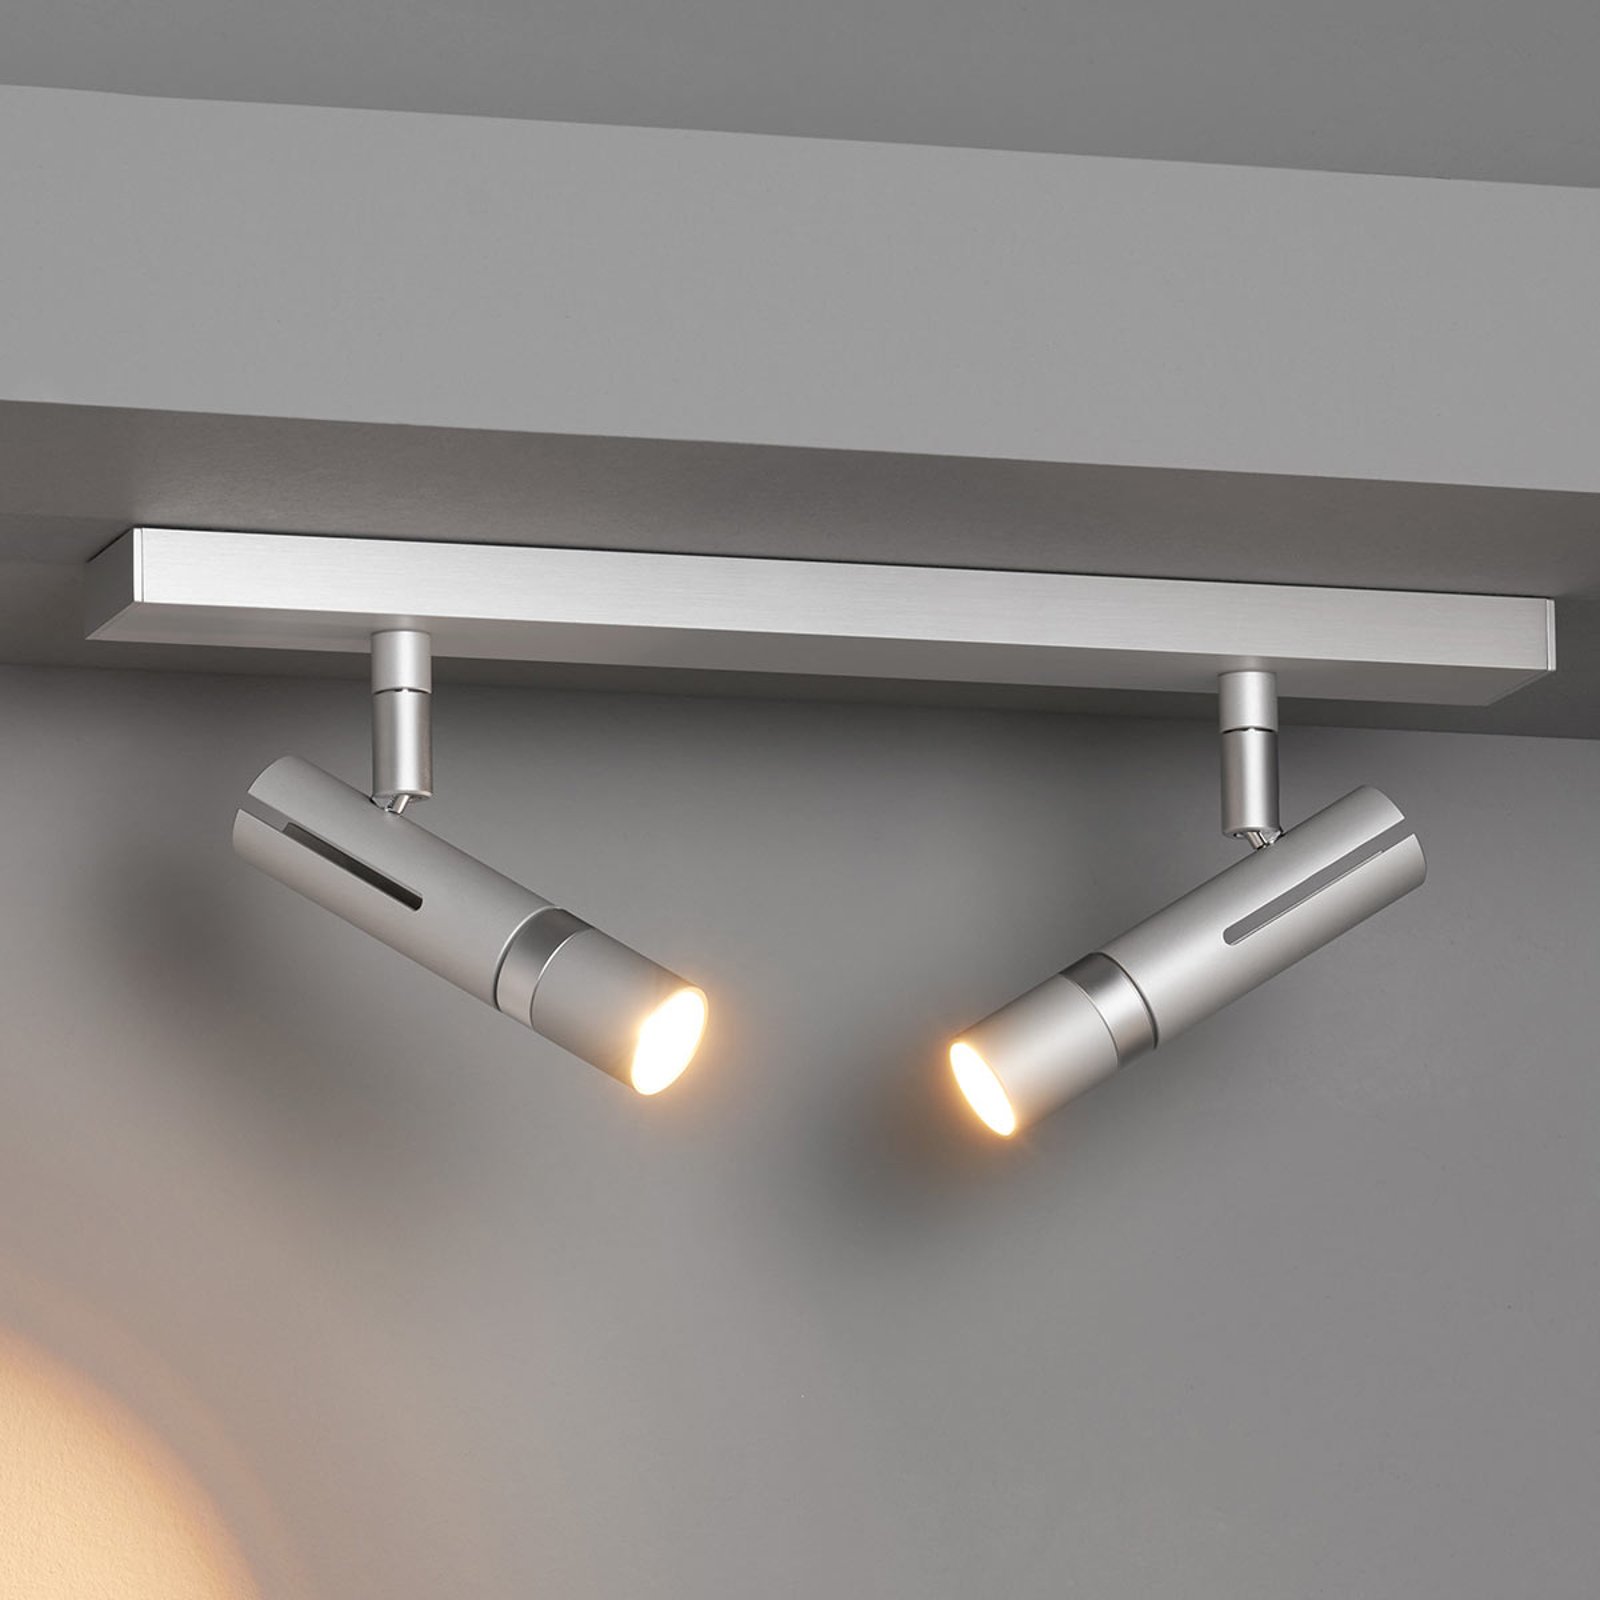 LDM Kyno Spot Duo loftbeslag påmontering, alu-krom